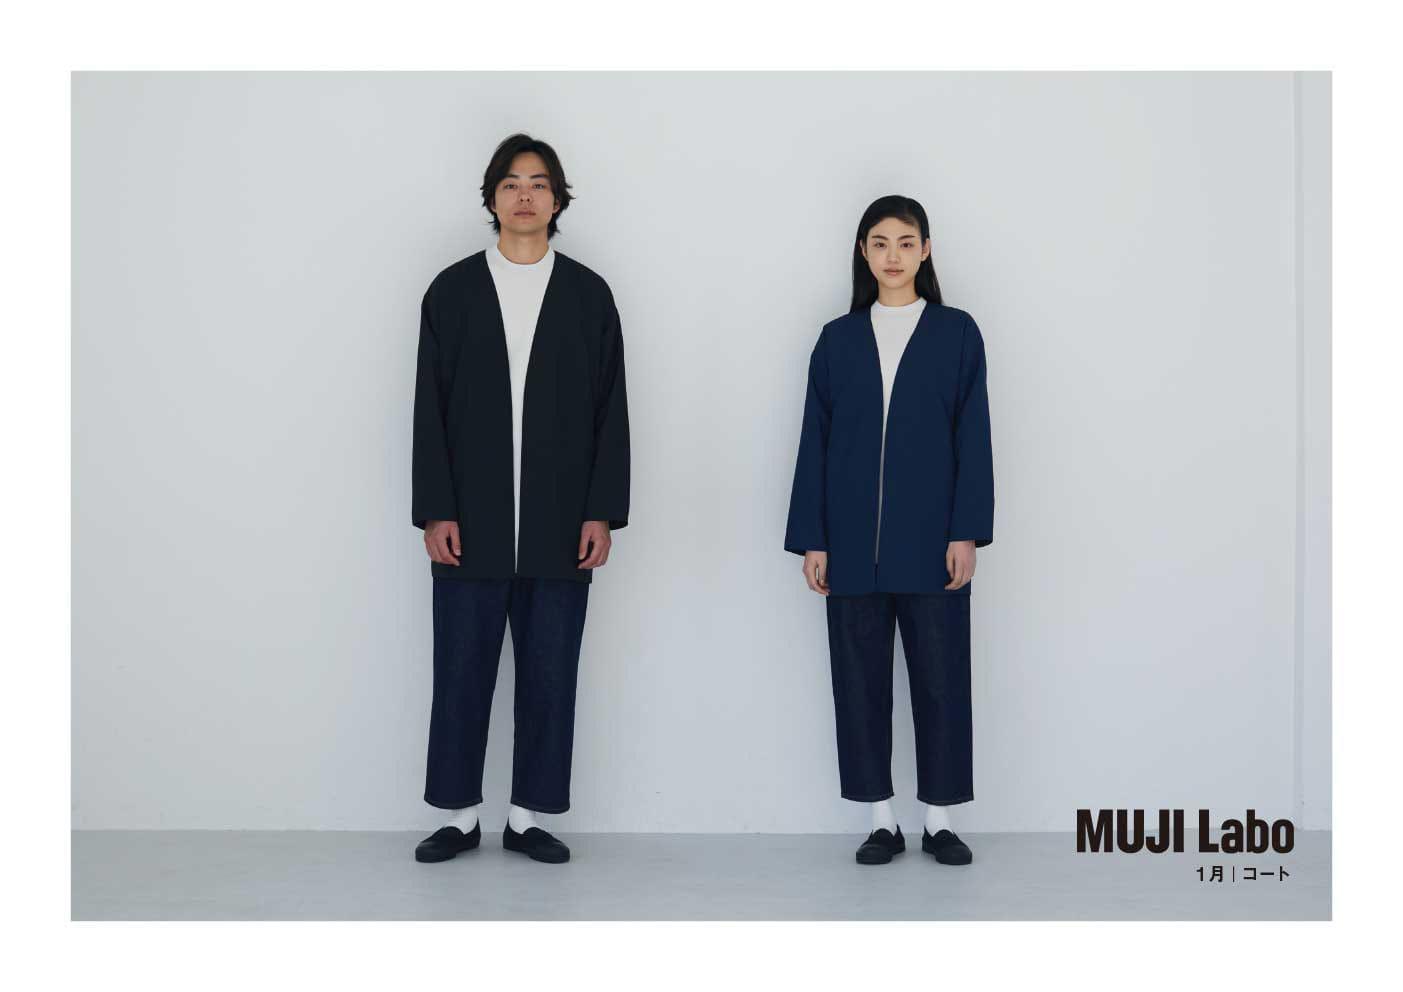 8d2ae91a40 良品計画が展開する商品ライン「MUJI Labo」が、2019年春夏シリーズの商品を1月16日に全国の無印良品と無印良品ネットストアで発売する。今シーズンからアパレル商品は  ...